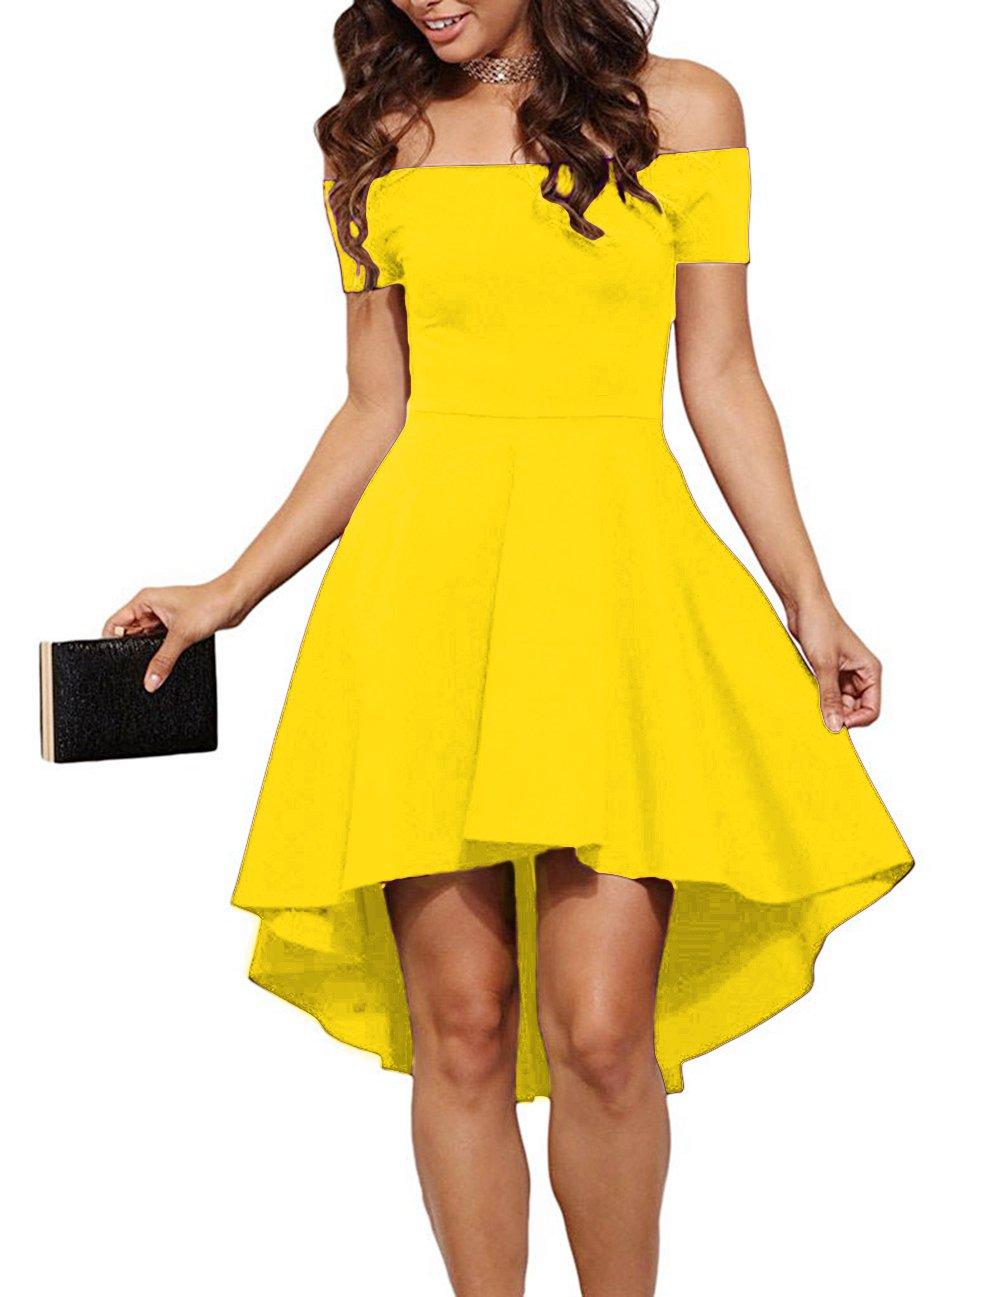 169d98ab889 Galleon - Sarin Mathews Women Off The Shoulder Short Sleeve High Low  Cocktail Skater Dress Yellow XL